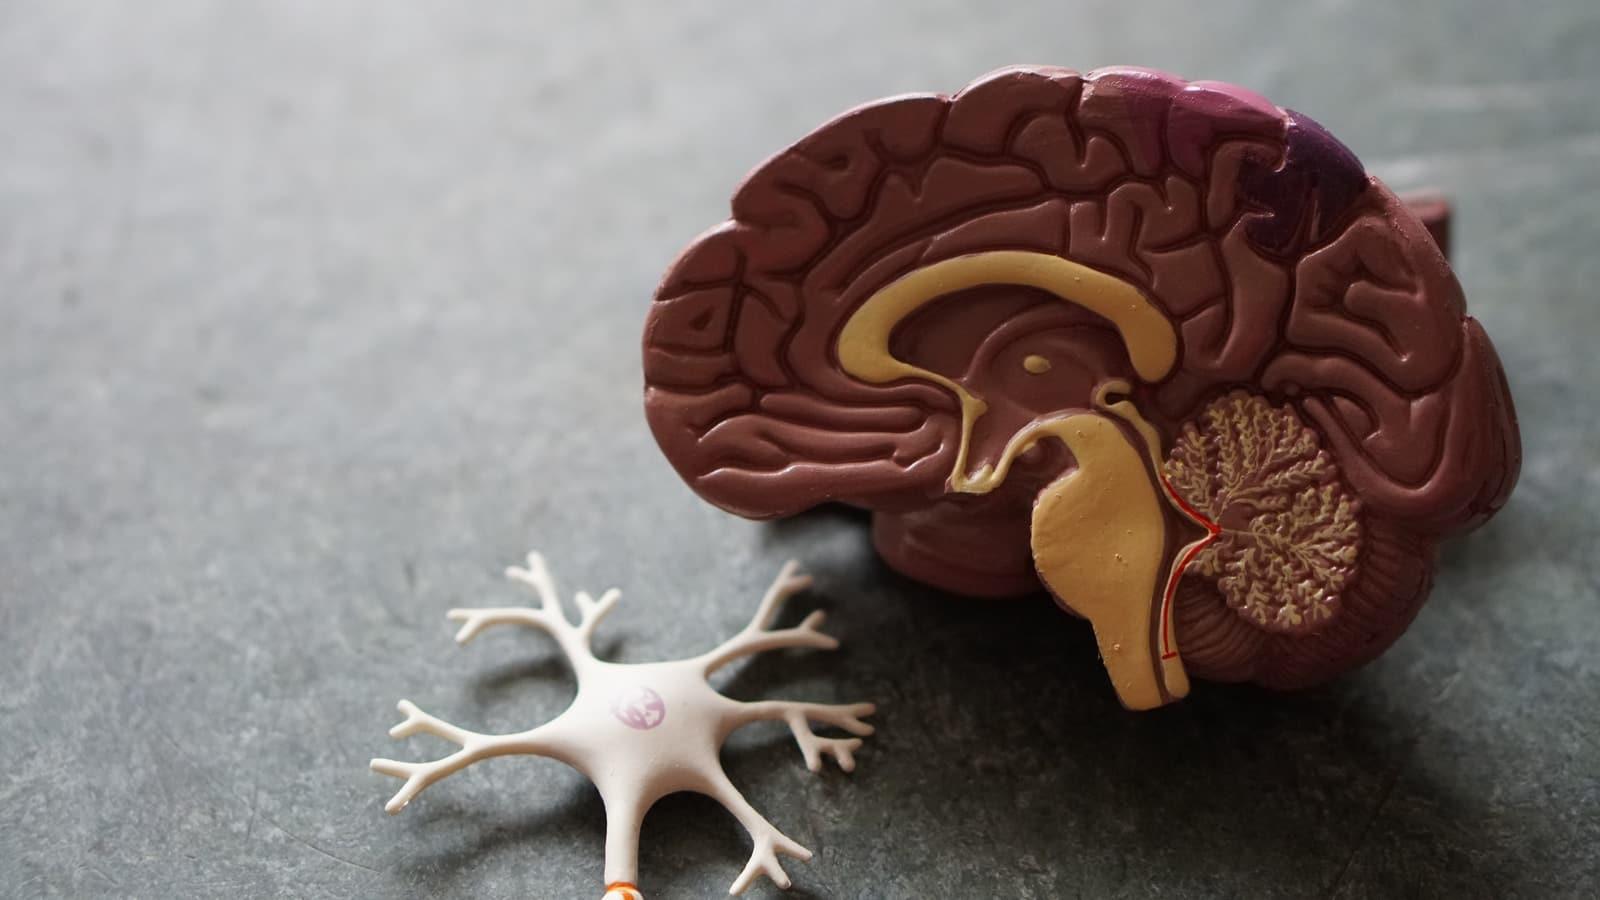 human brain toy